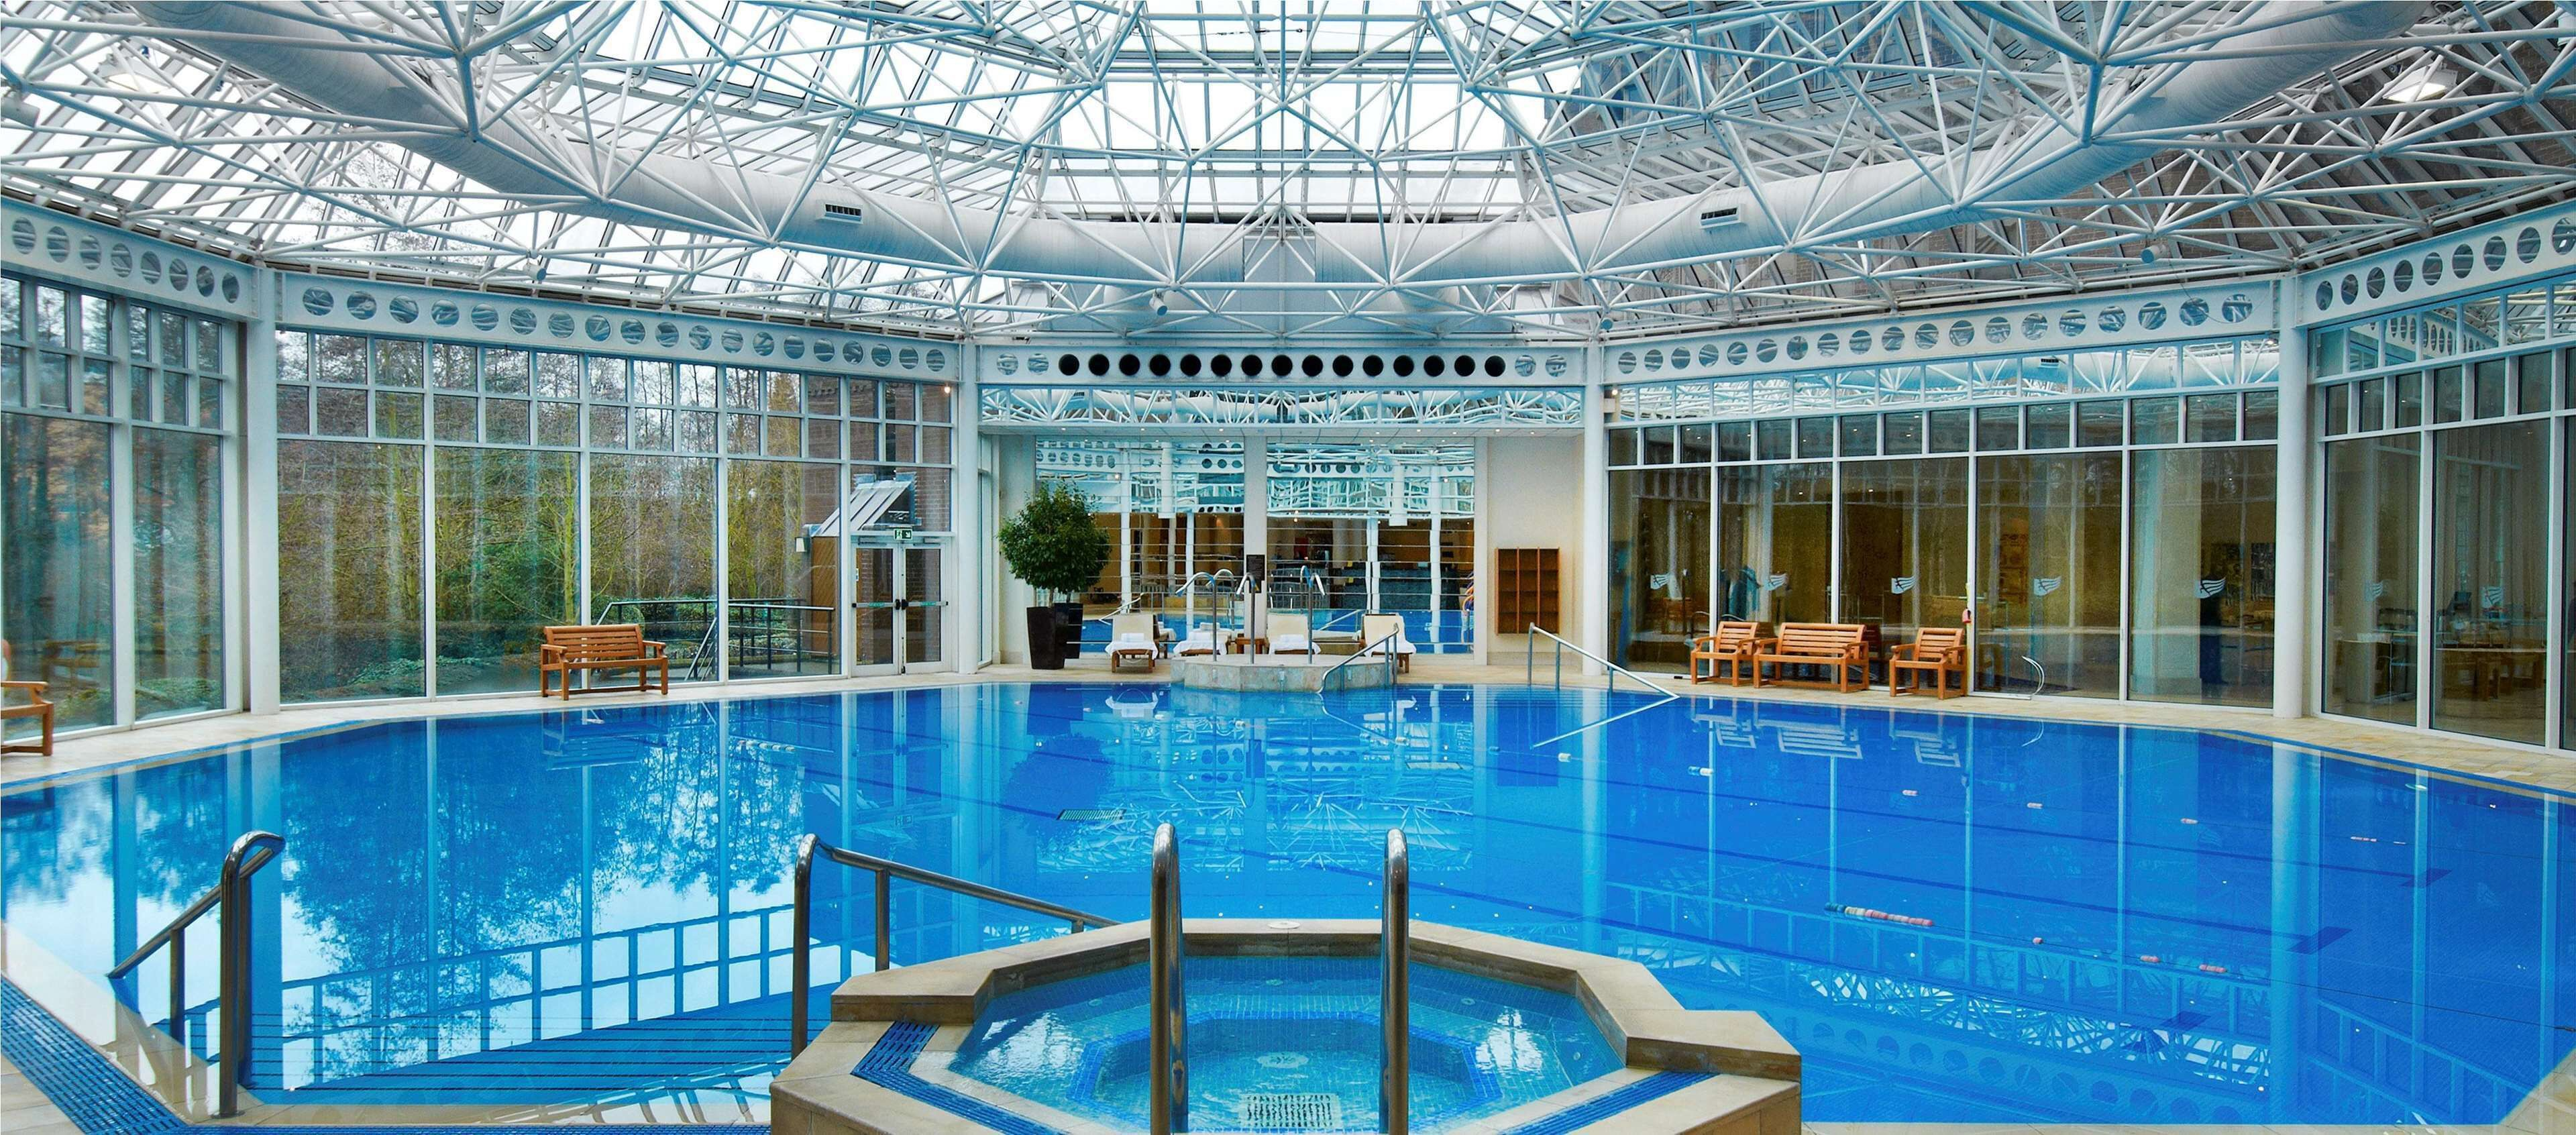 Courtesy of Hilton Birmingham Metropole / Expedia